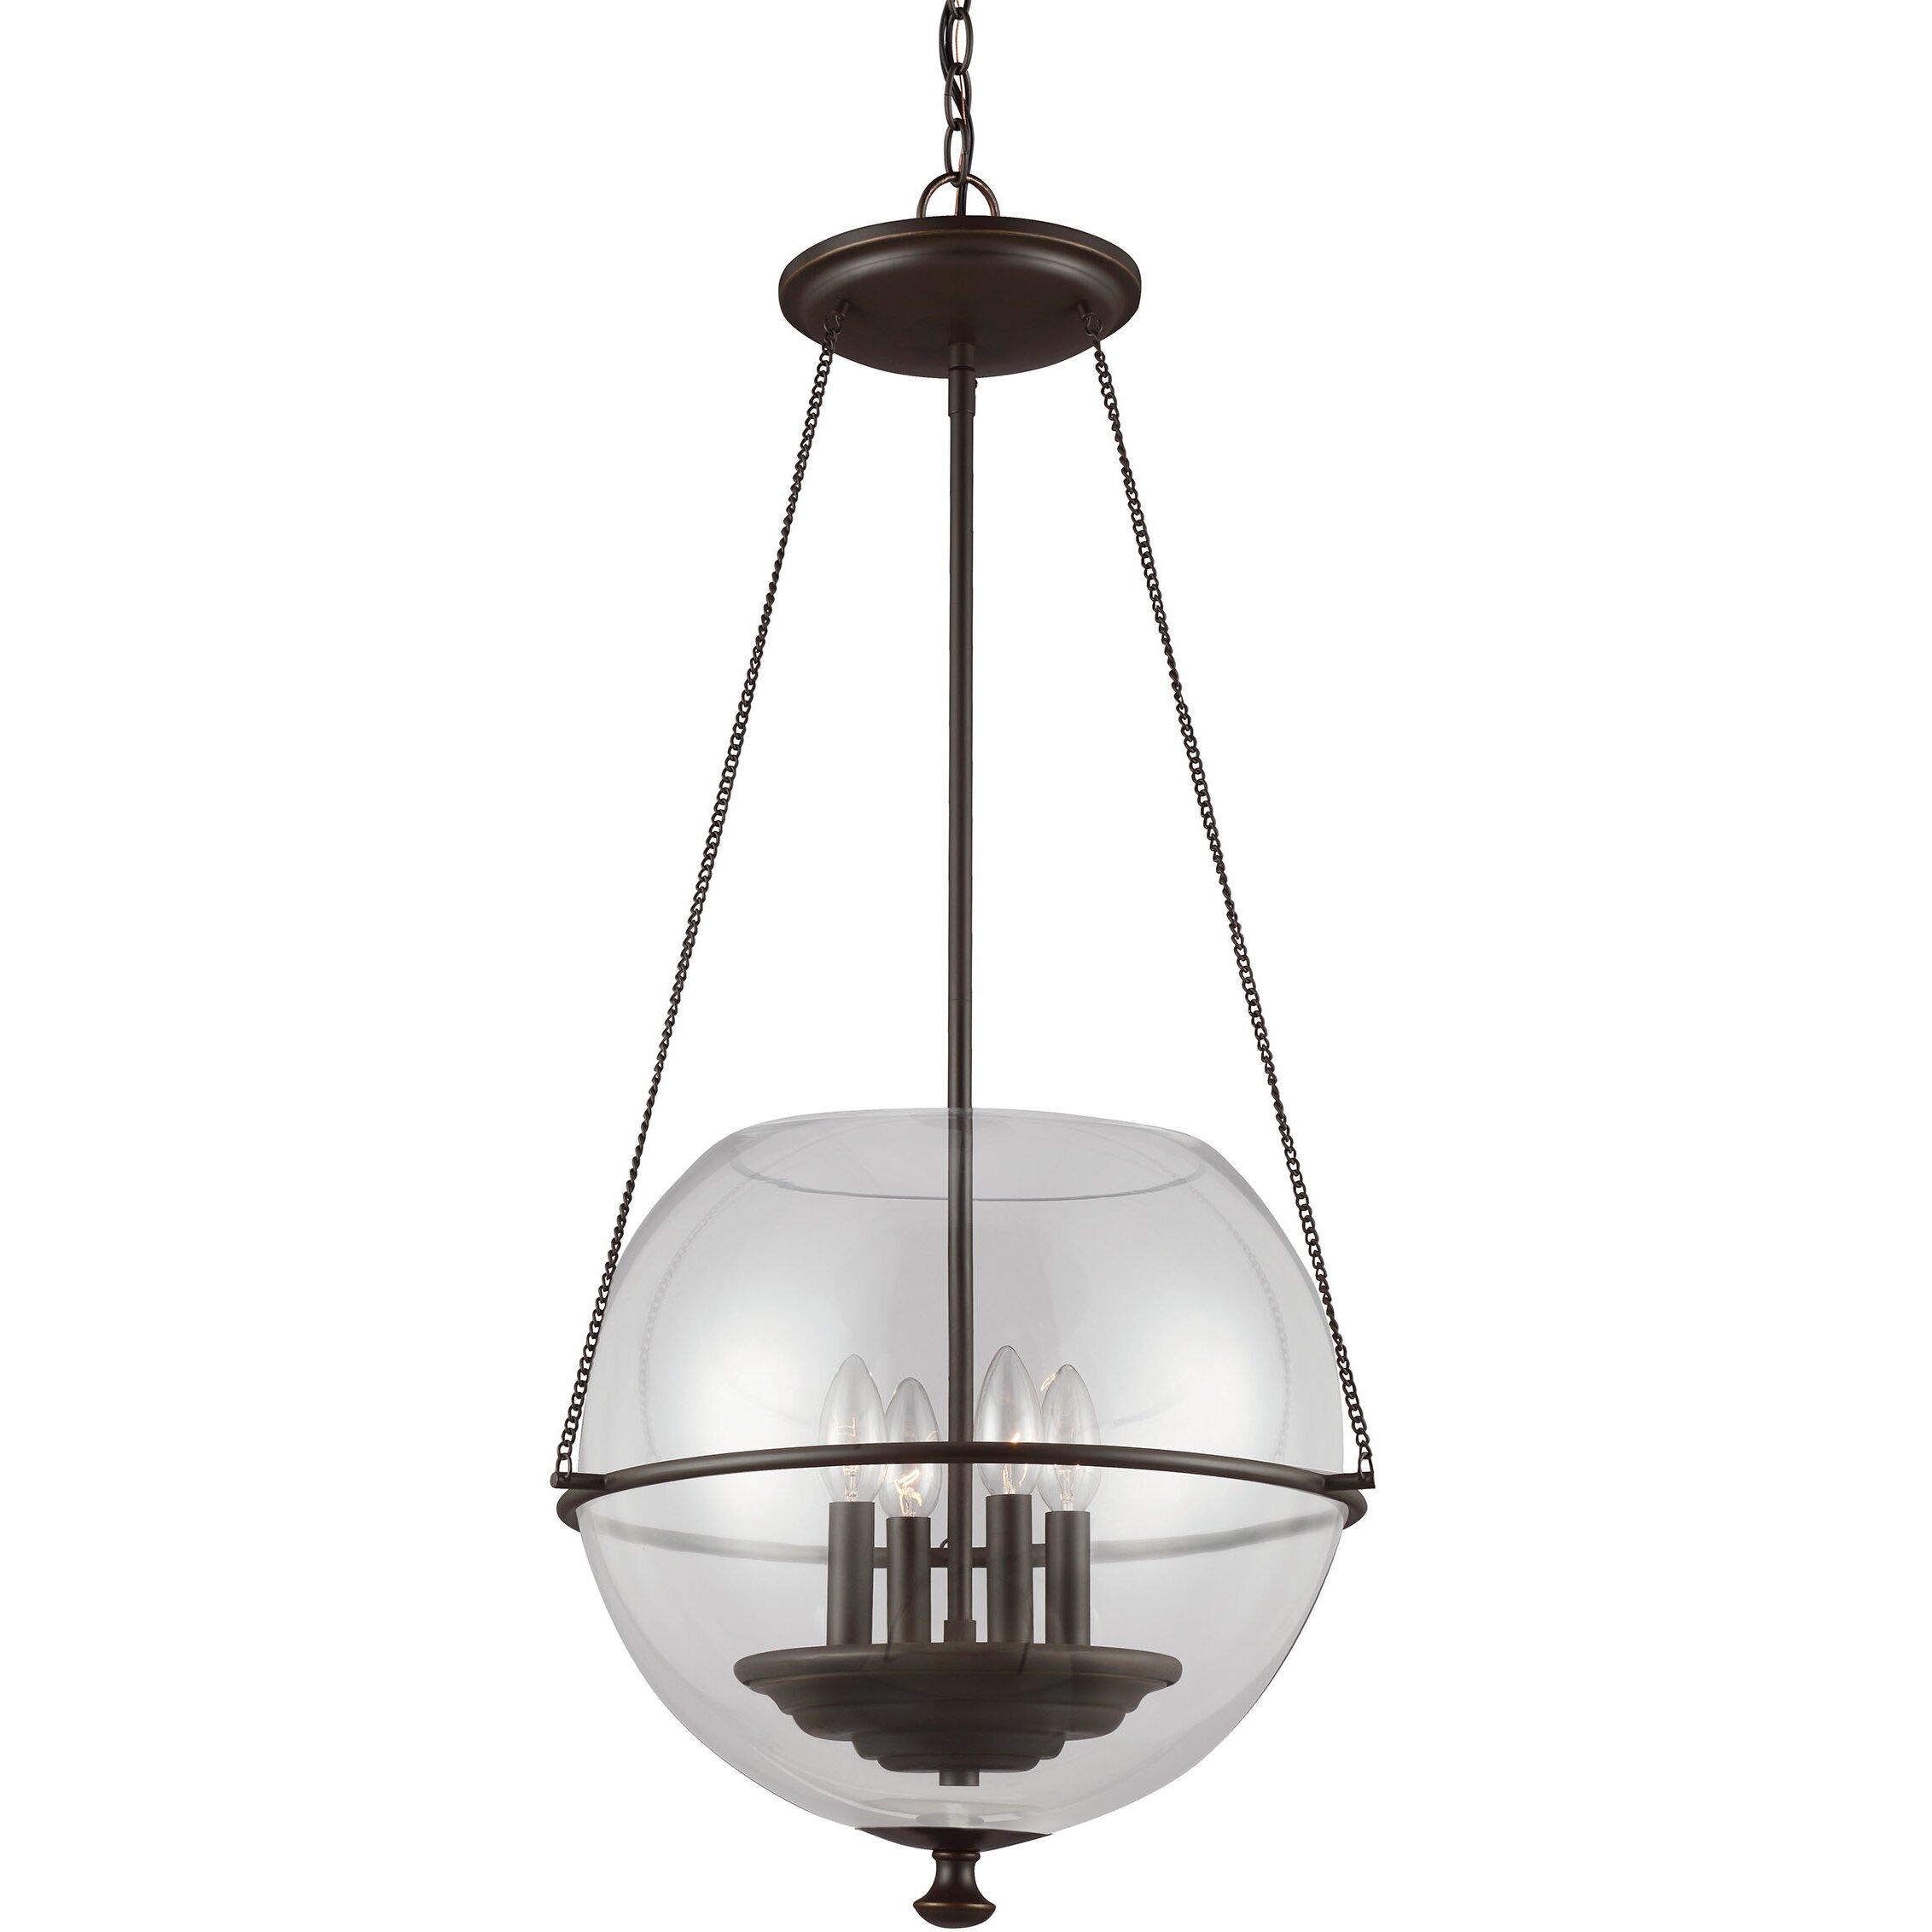 Sea Gull Lighting Havenwood 4-Light Globe Pendant